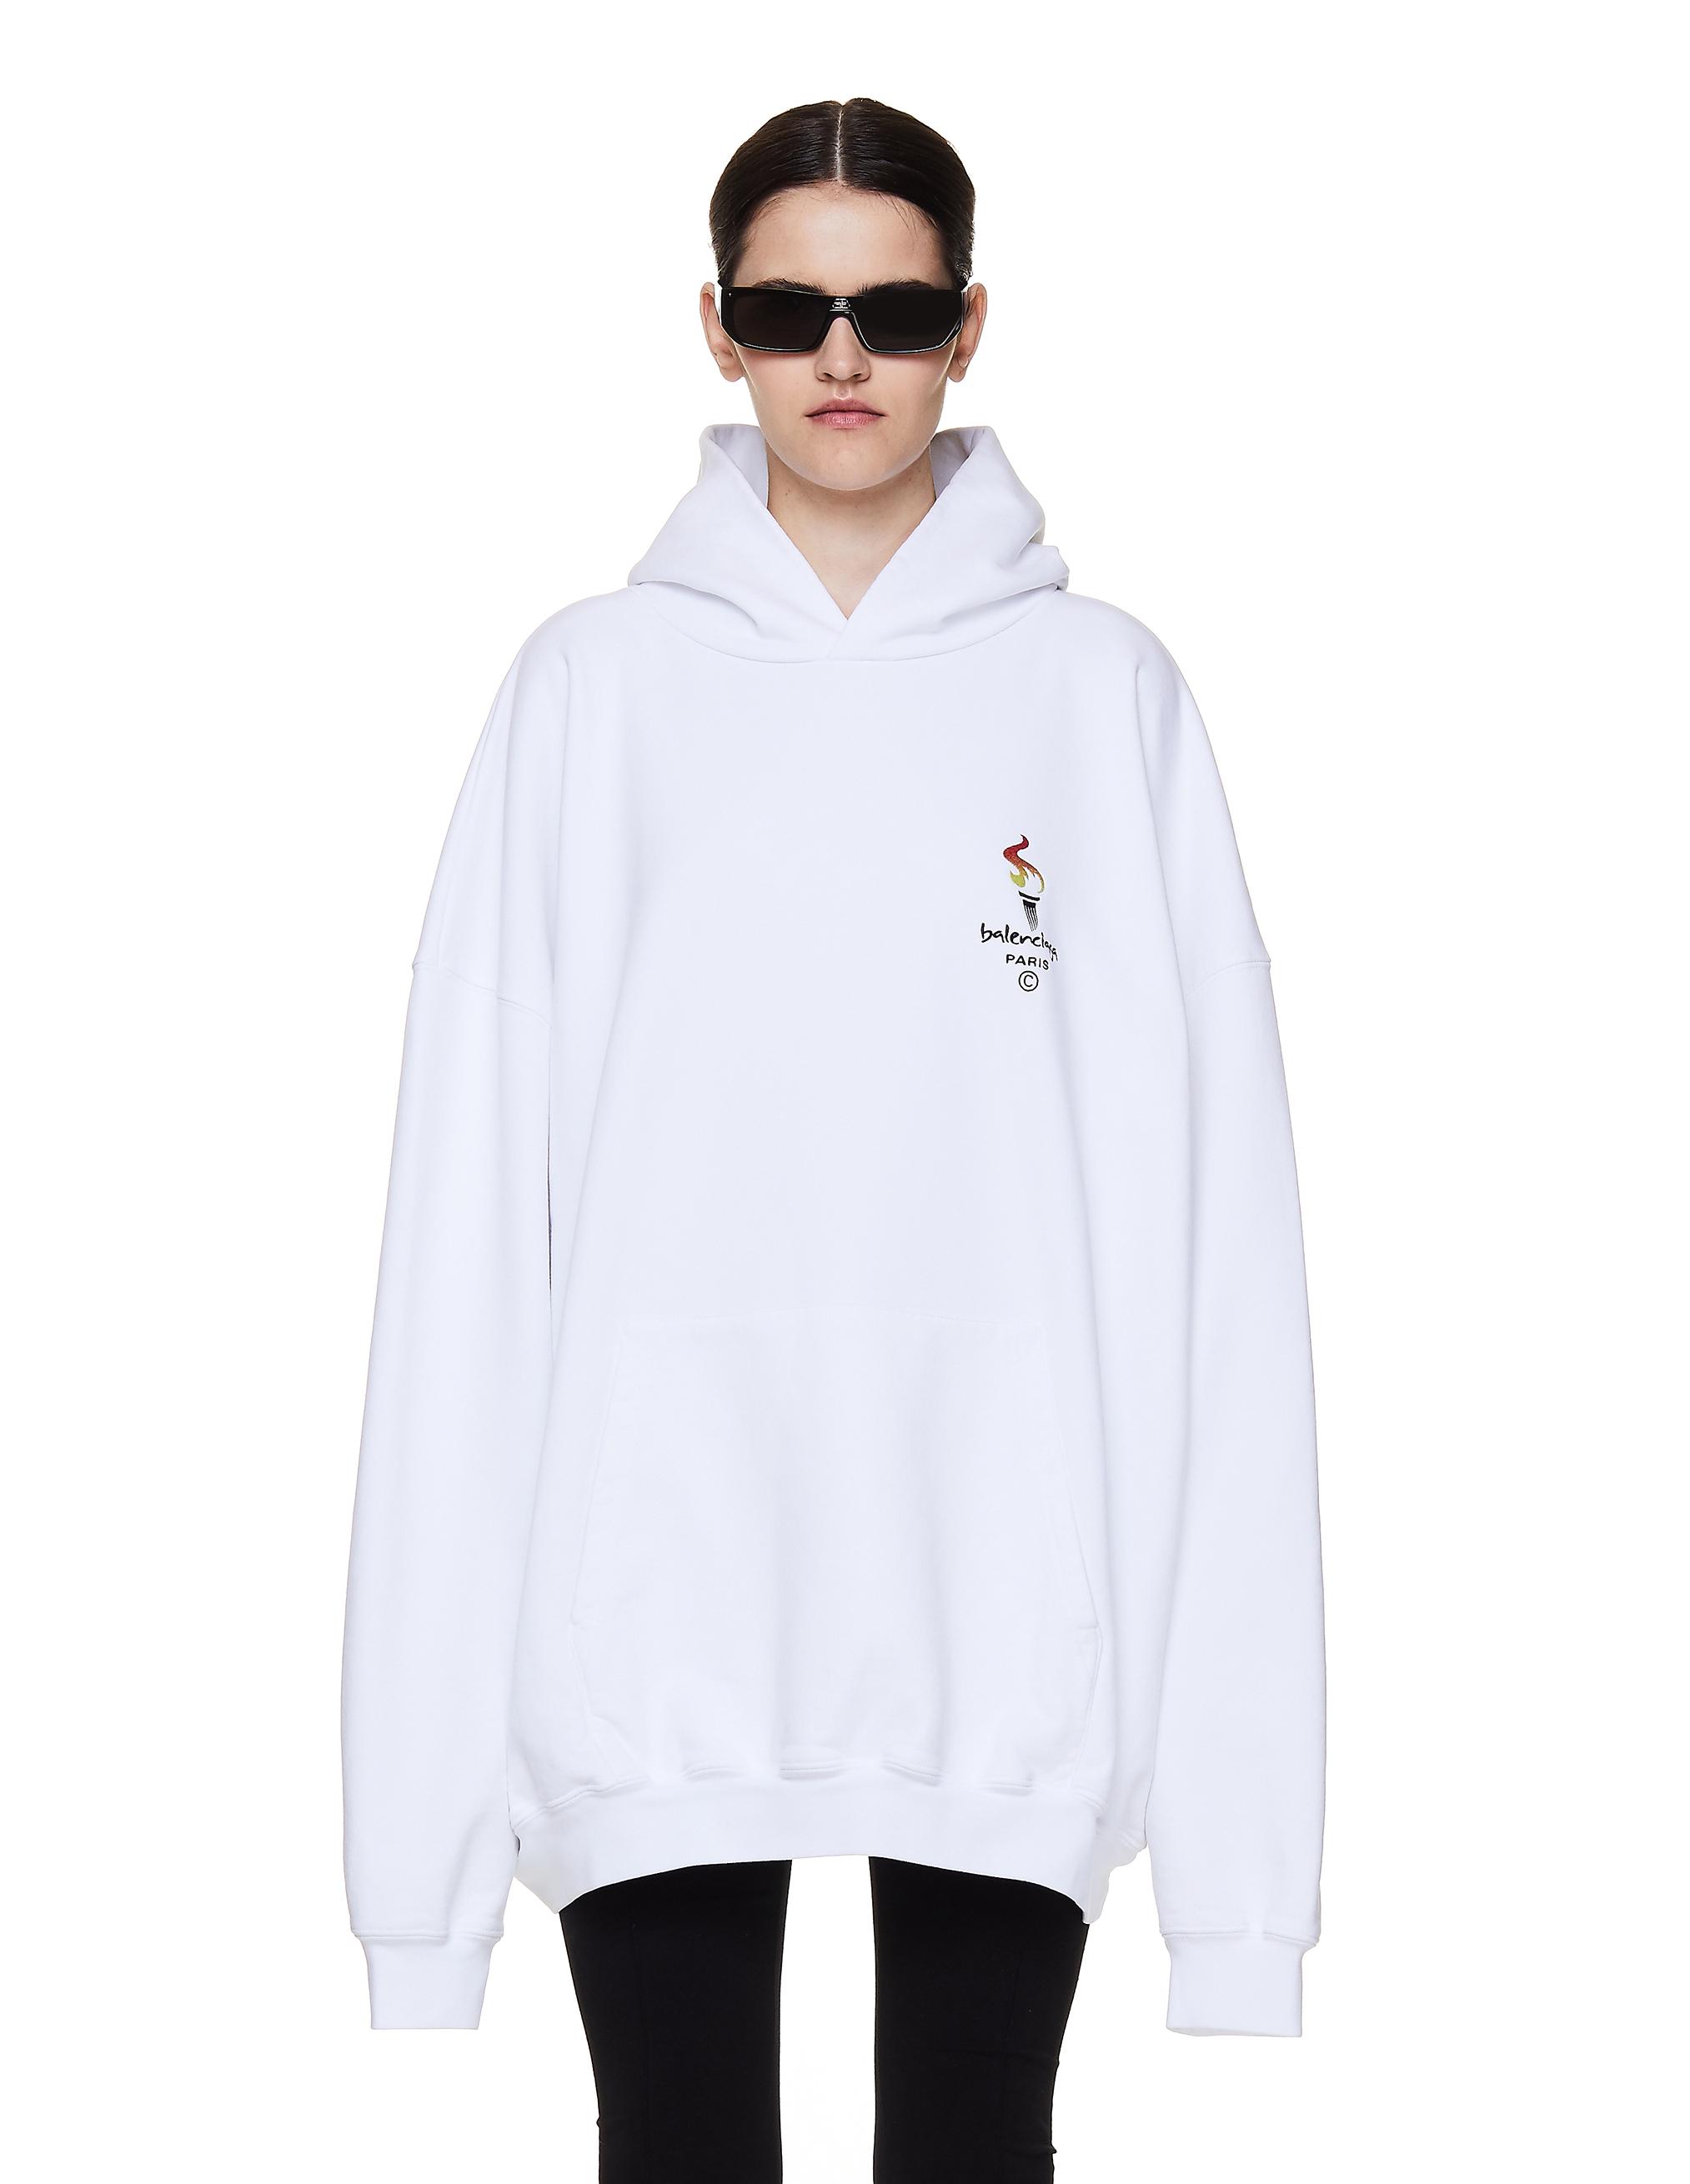 Balenciaga White Cotton Embroidered Hoodie